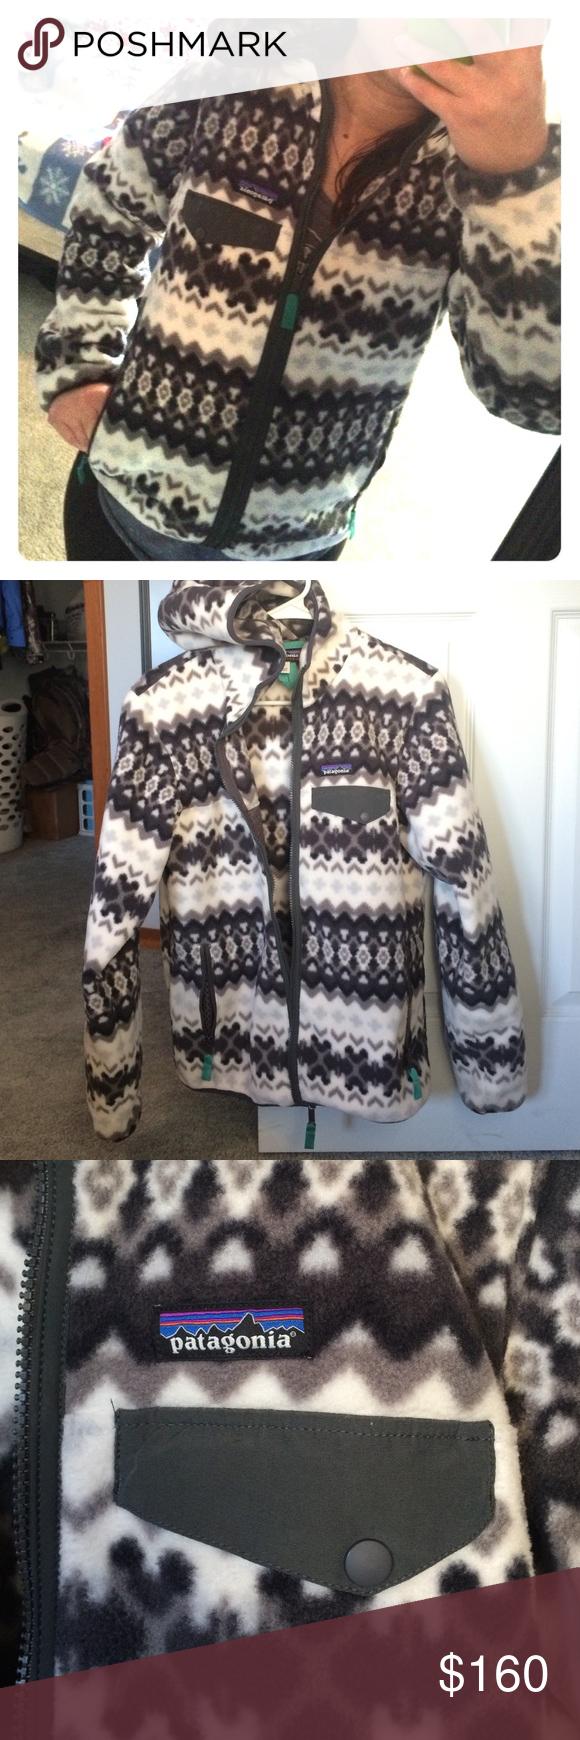 Like new womens fun print patagonia fleece jacket like new only